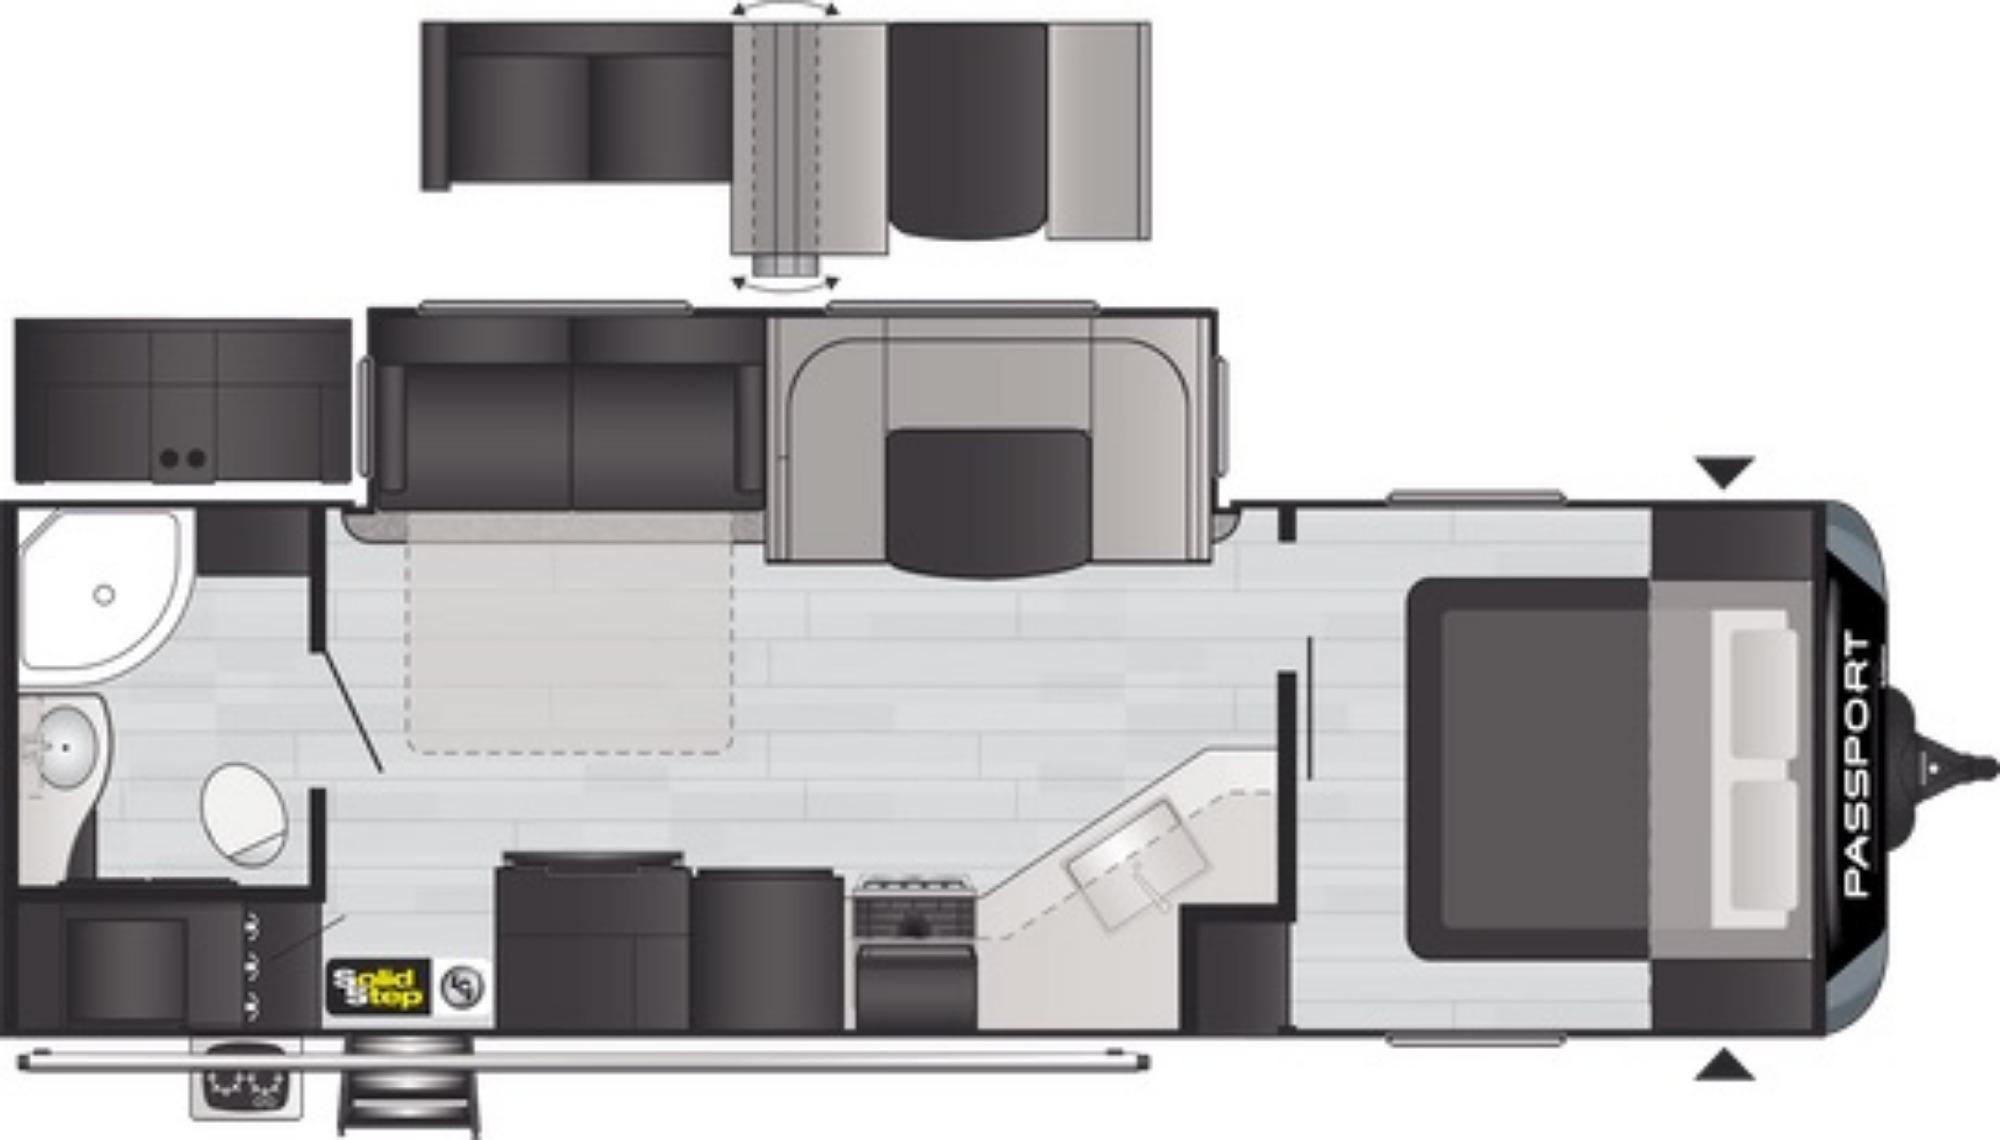 View Floor Plan for 2021 KEYSTONE PASSPORT 2710RB